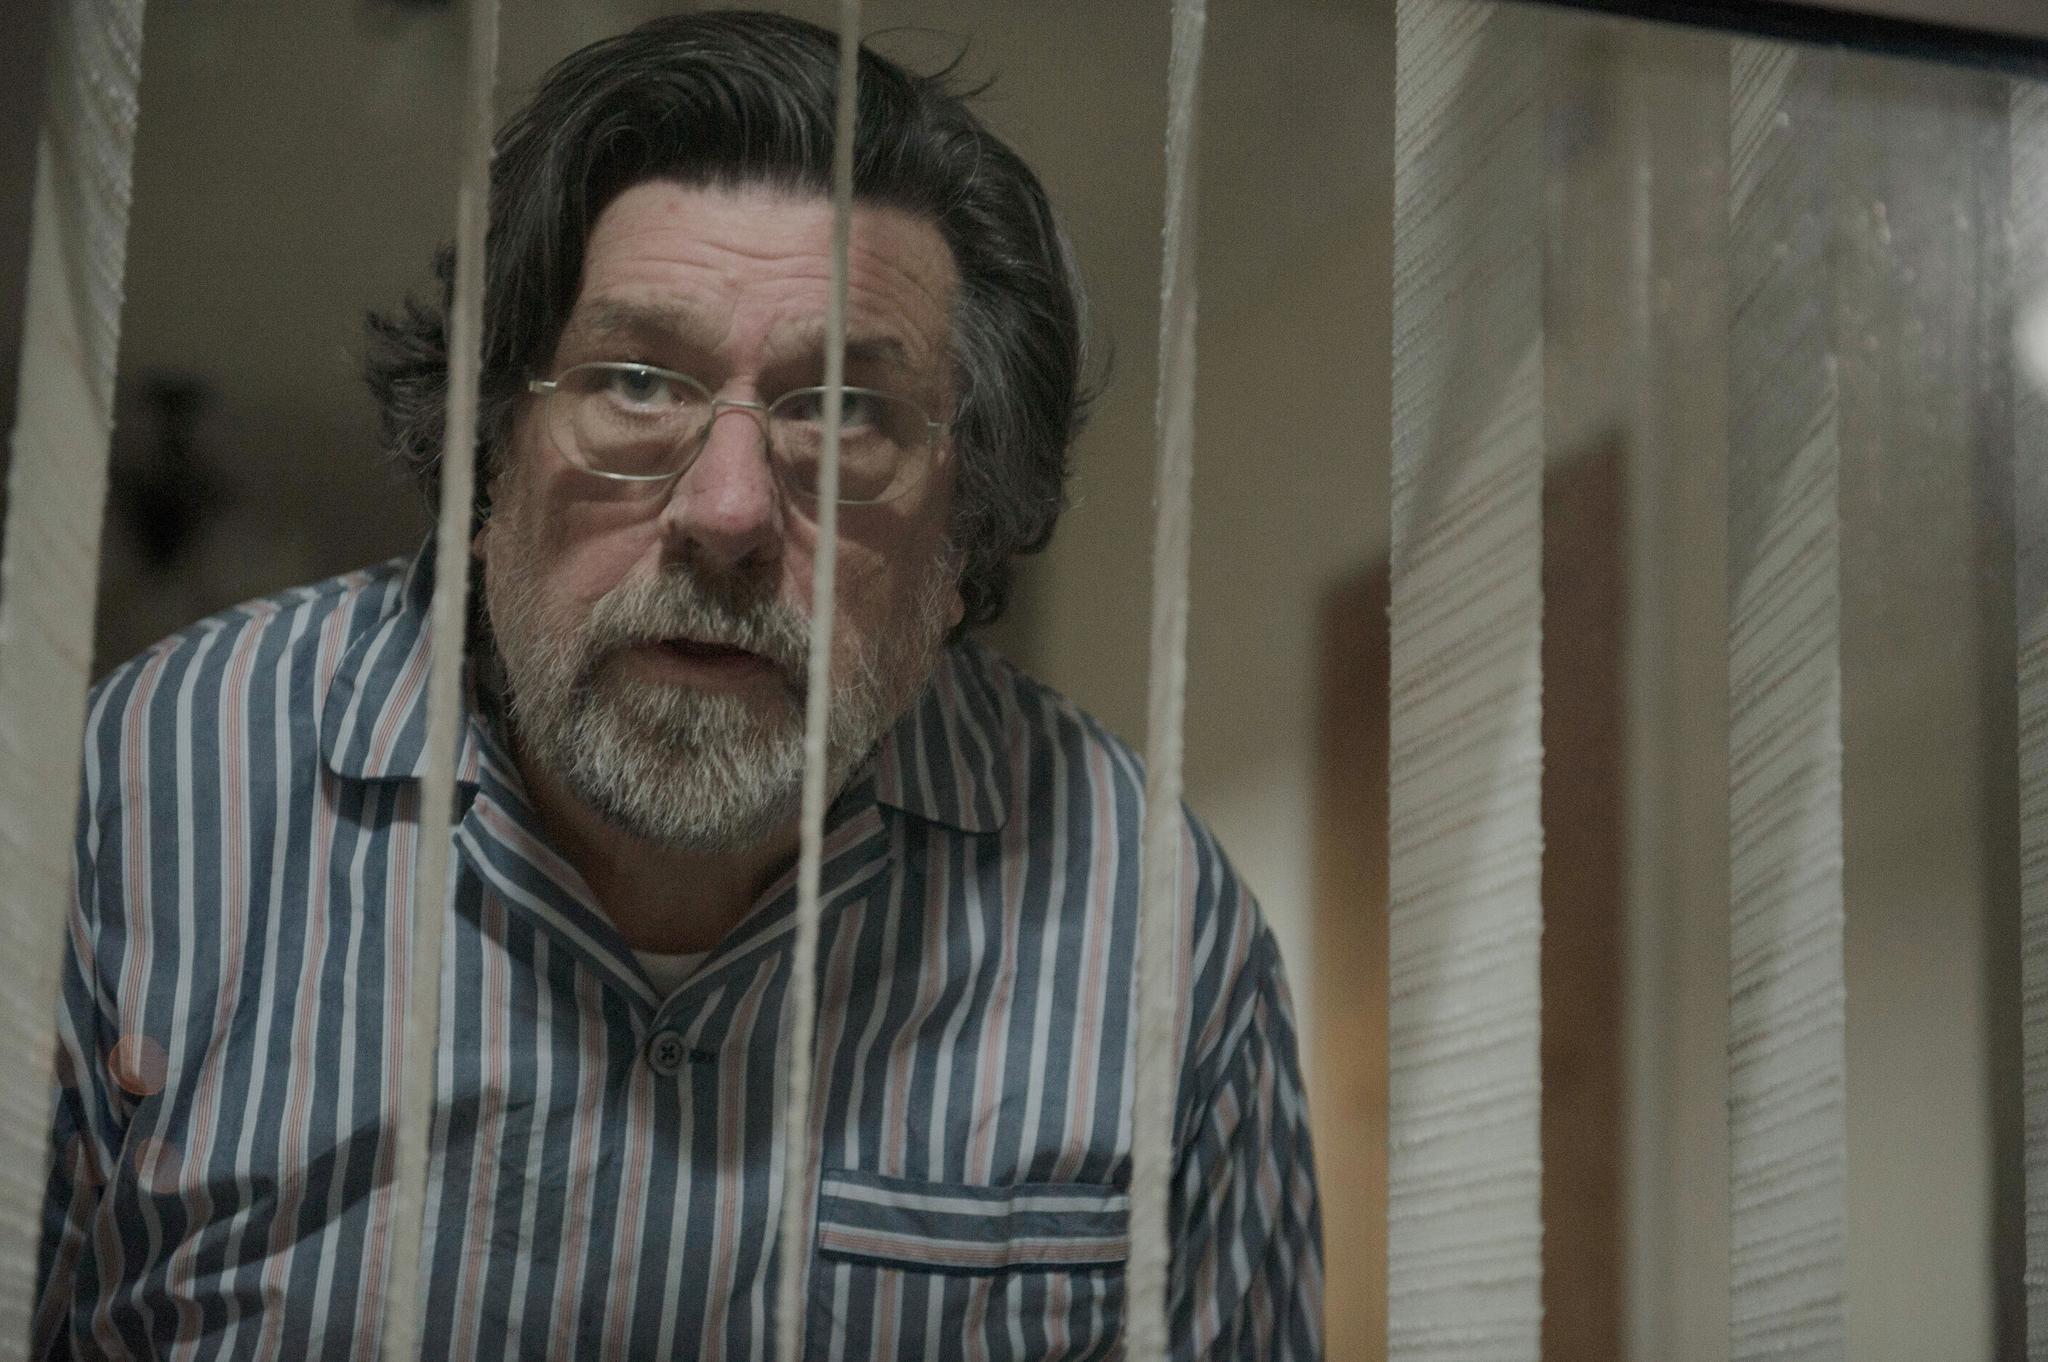 Ricky Tomlinson (born 1939) Ricky Tomlinson (born 1939) new photo